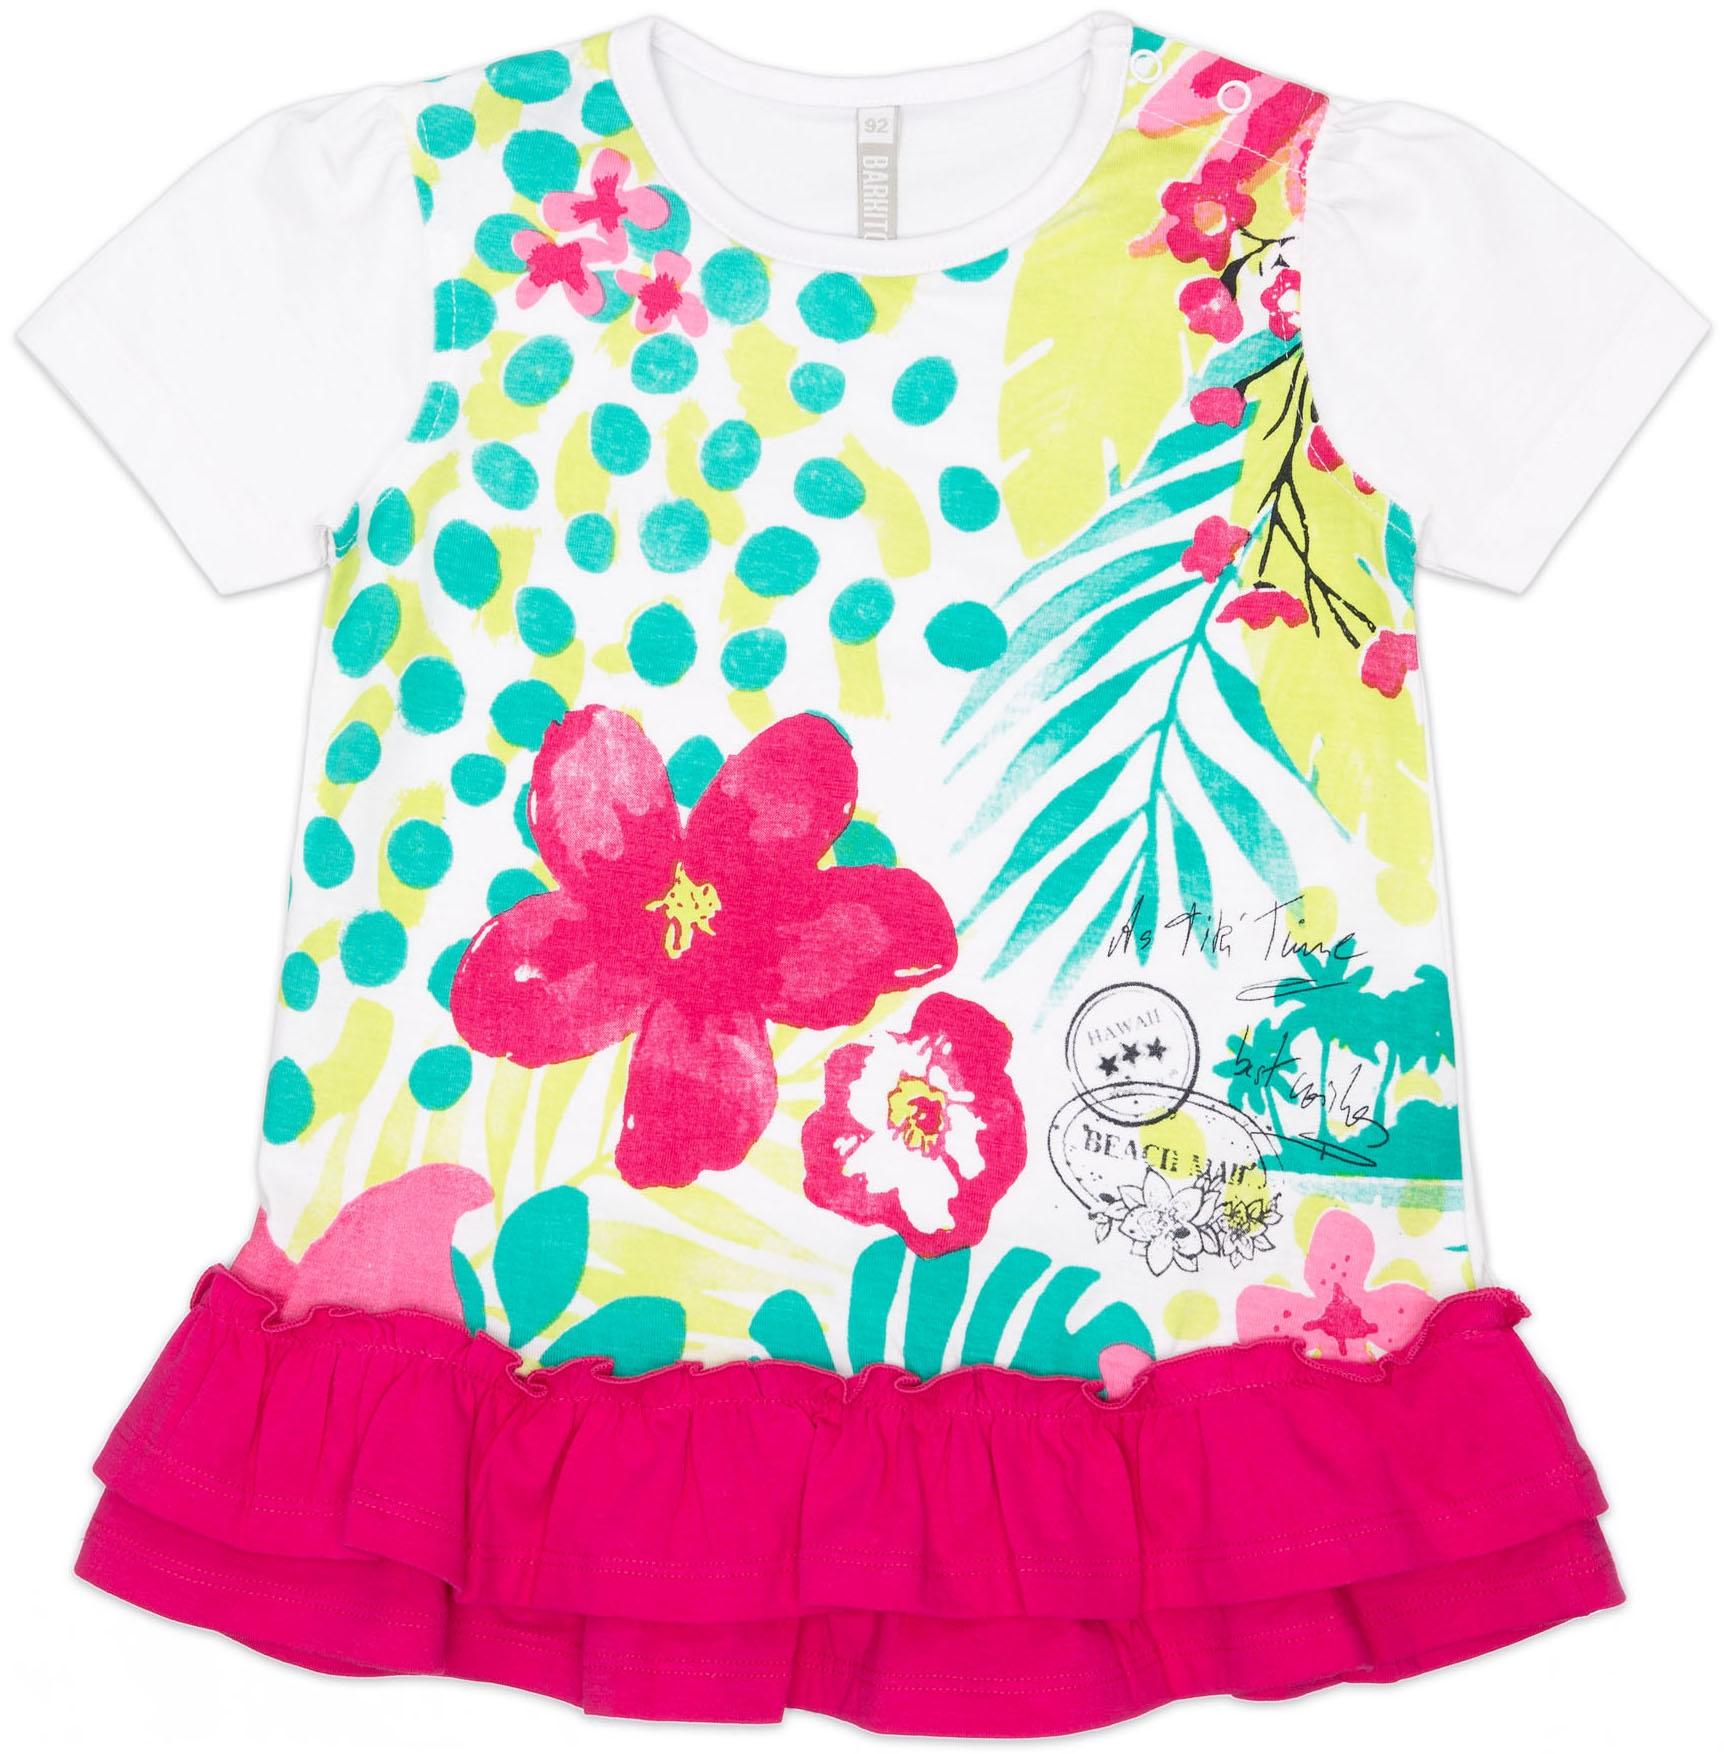 "Фото Туники Barkito Туника с коротким рукавом для девочки Barkito, ""Алоха Гавайи!"", темно-розовая, с рисунком ""цветы"""